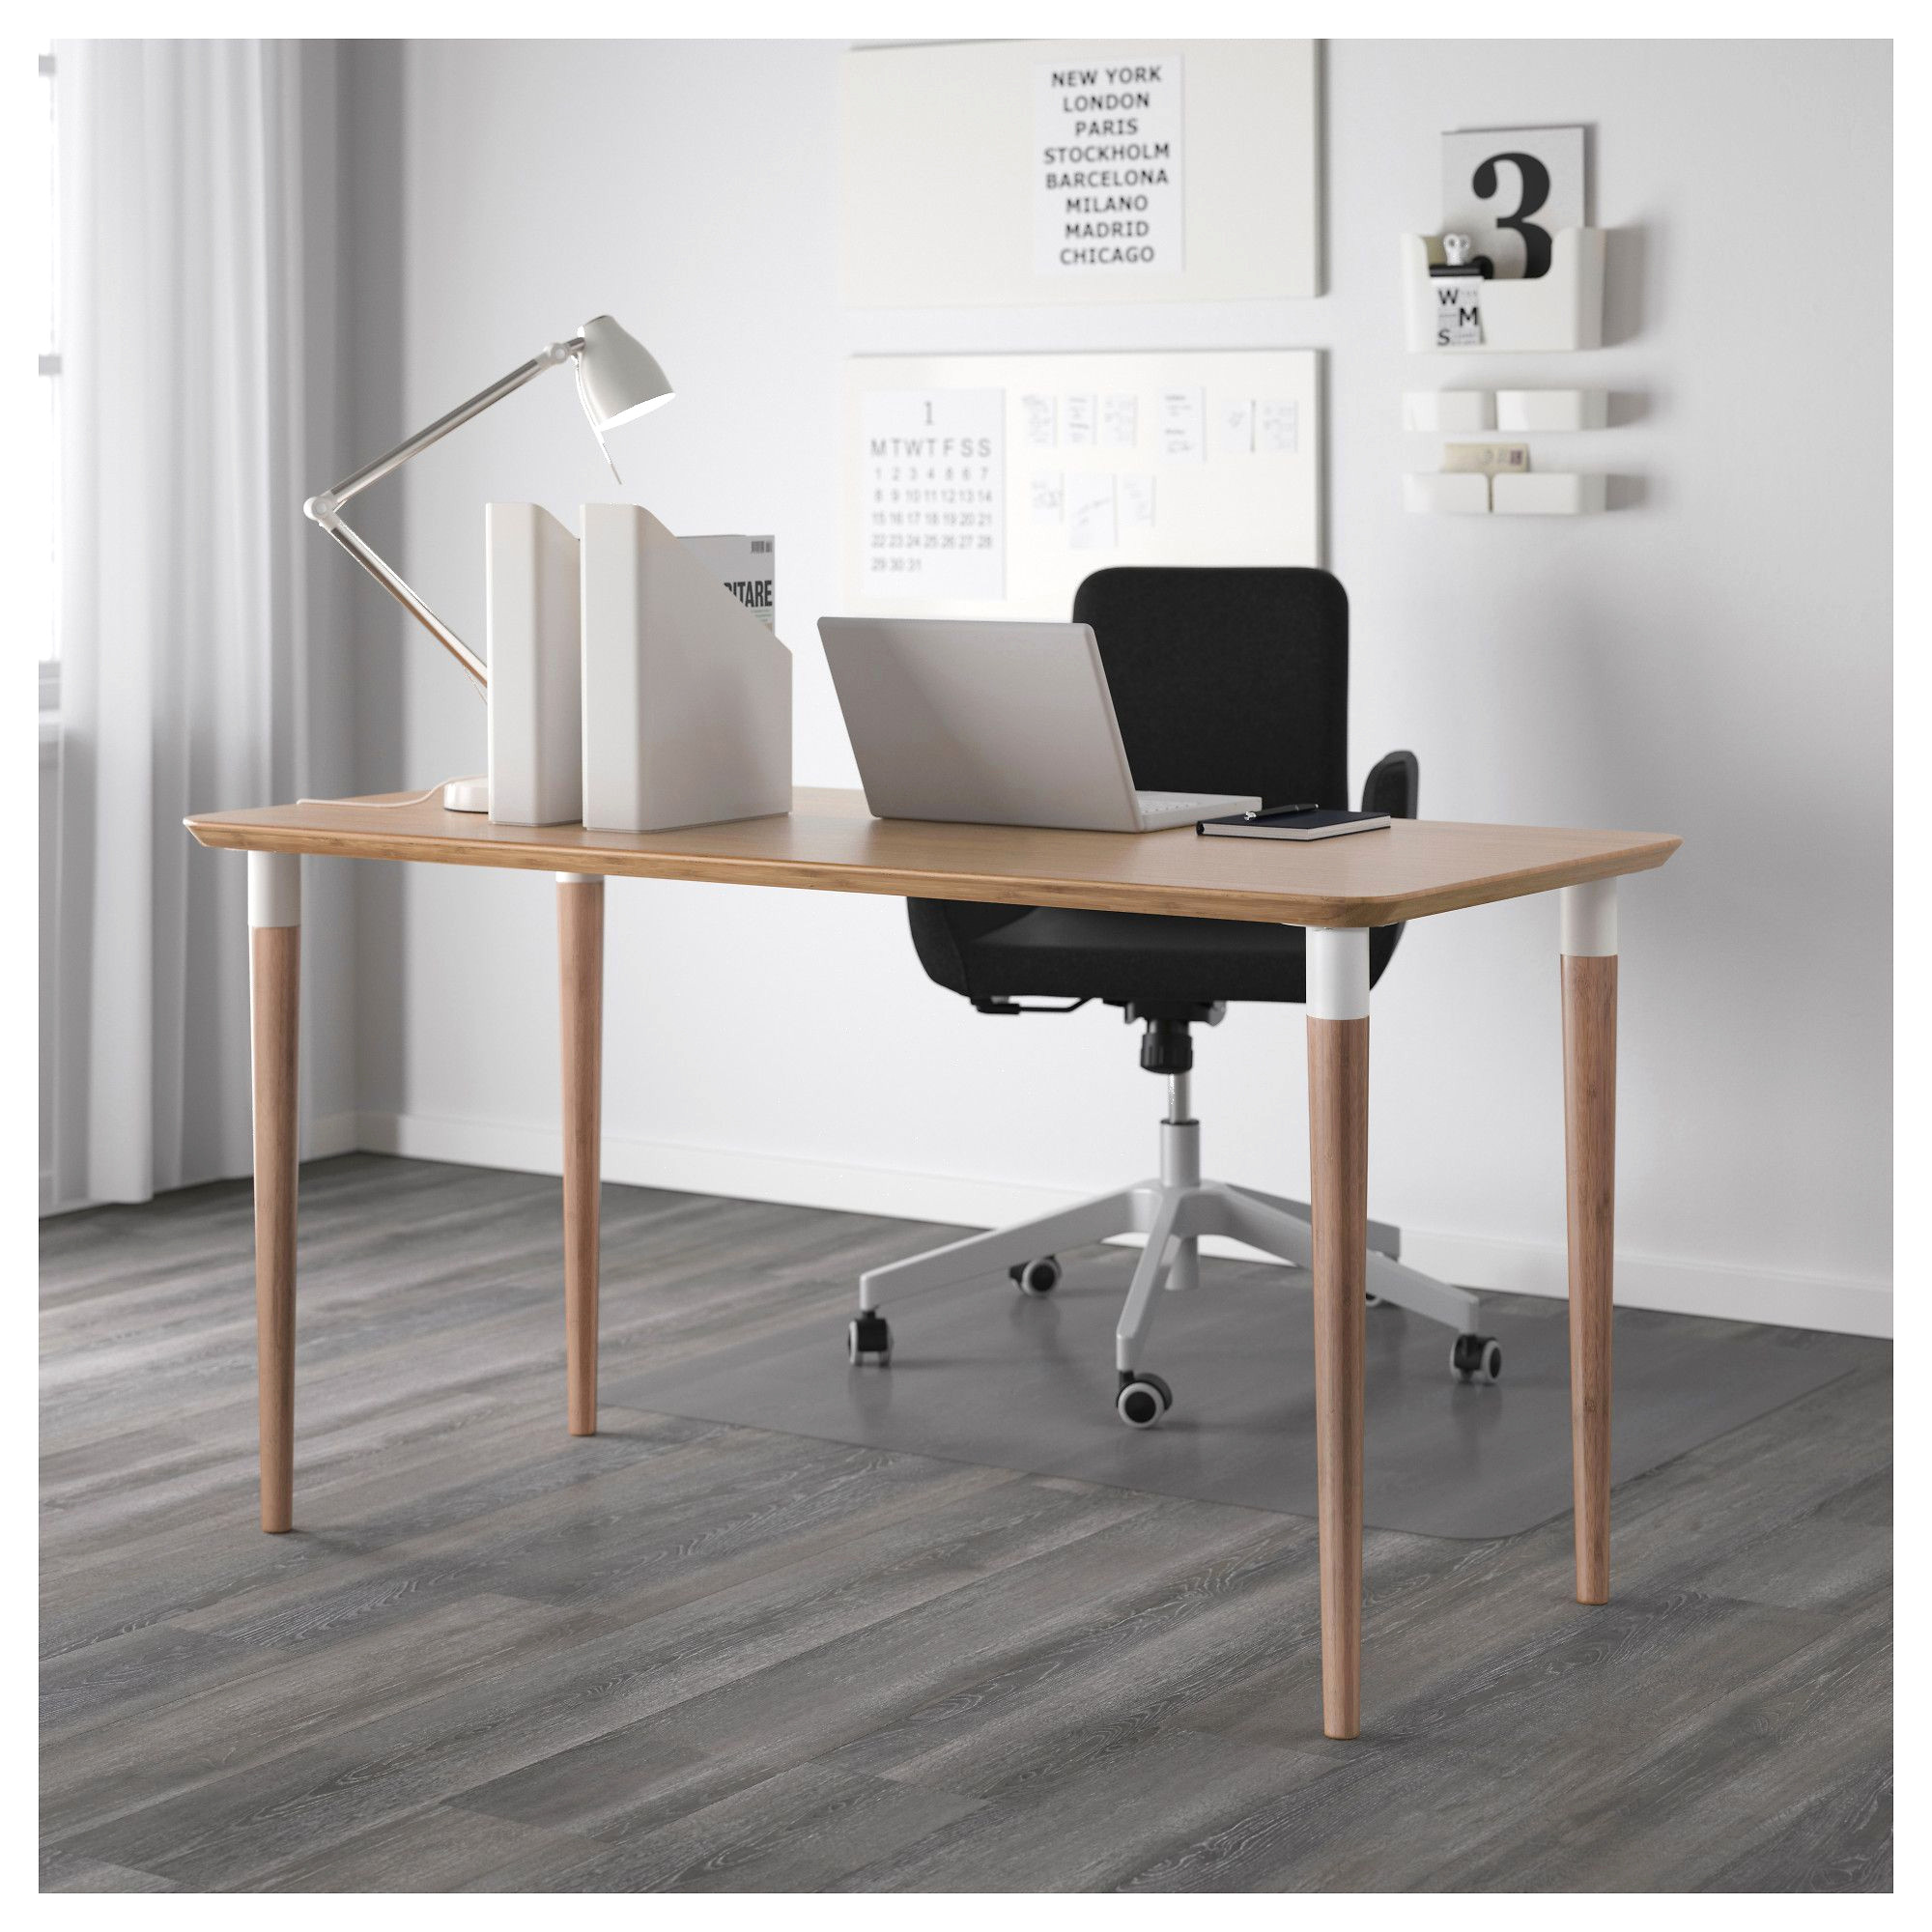 Ikea Galant Desk assembly Instructions 29 Einzigartig Galerie Von Ikea Schreibtisch Galant Careynewmexico Com